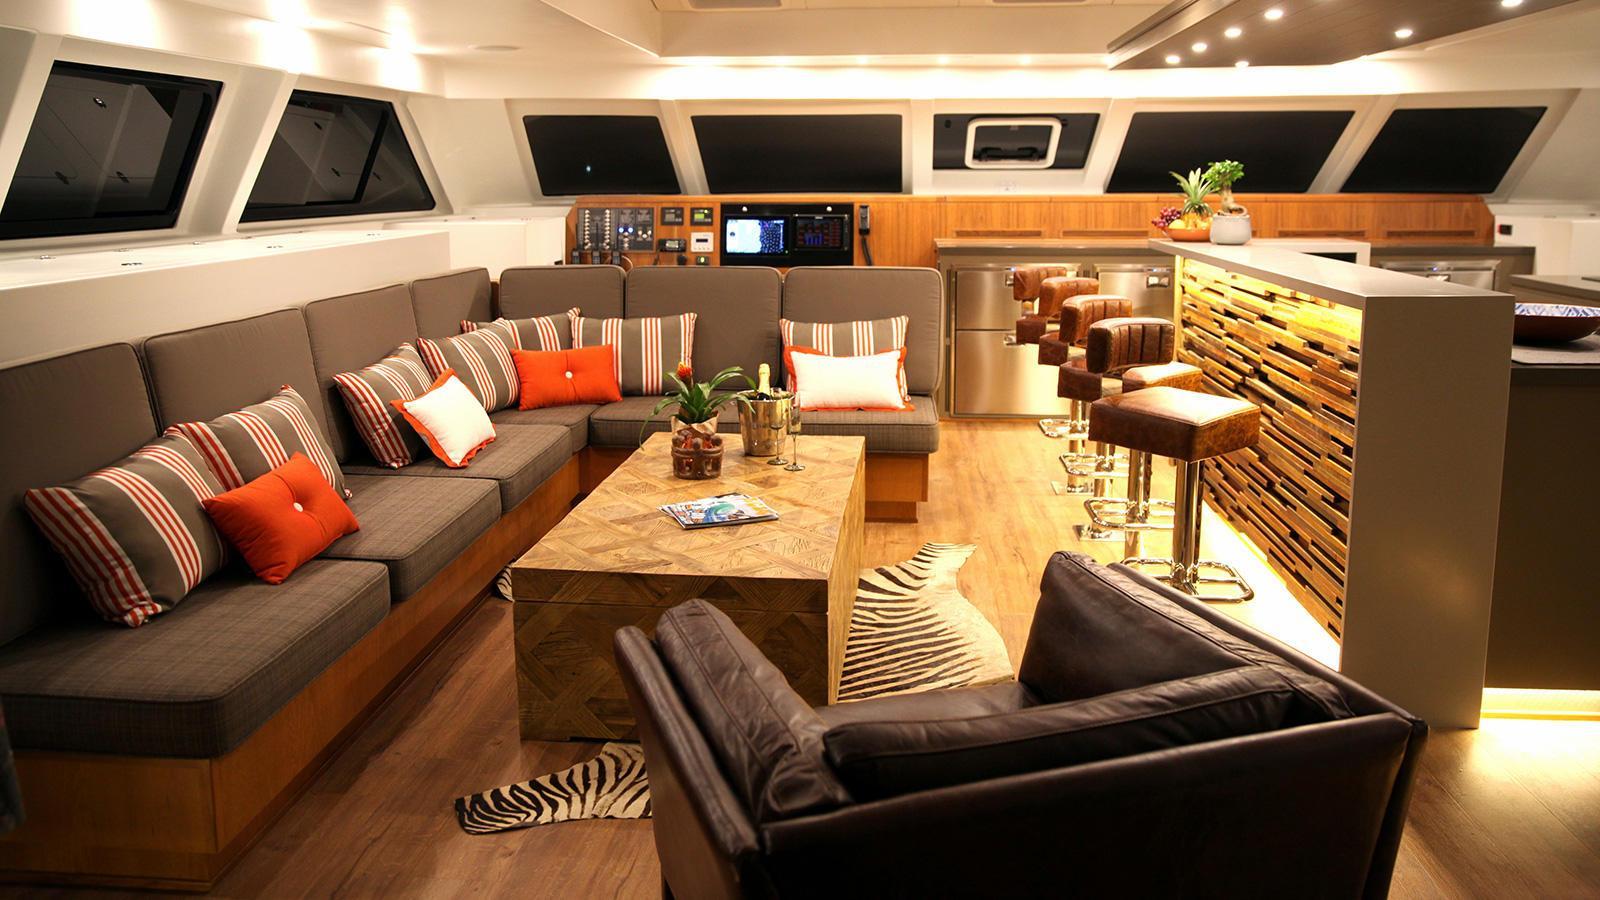 ultra vires catamaran motoryacht two oceans marine 2016 25m lounge